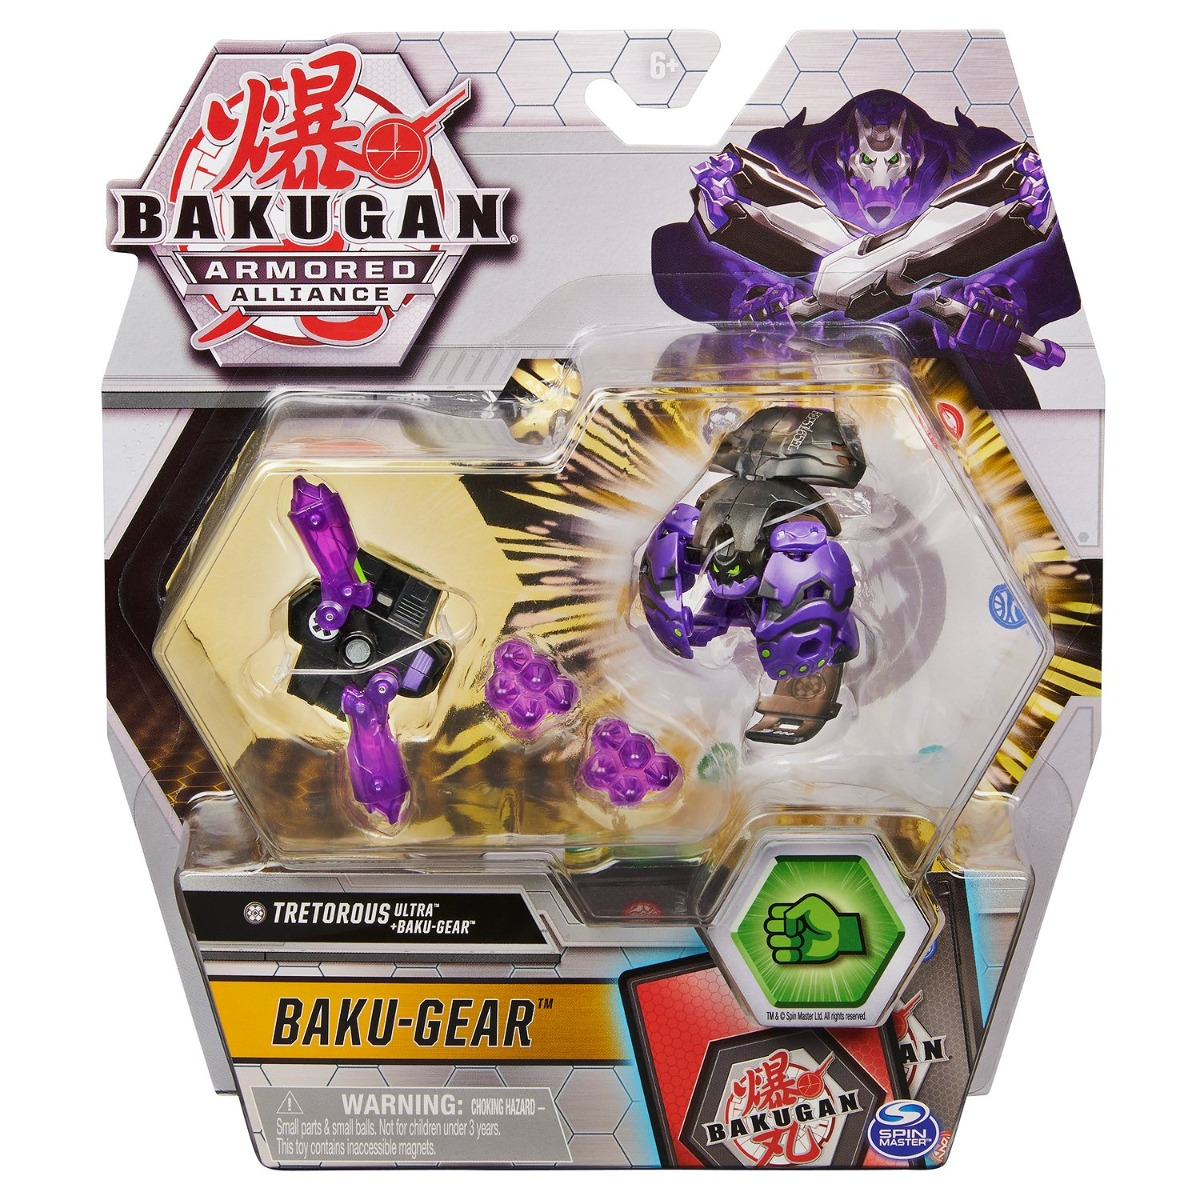 Figurina Bakugan Armored Alliance, Tretorous Ultra, Baku-Gear, 20126521